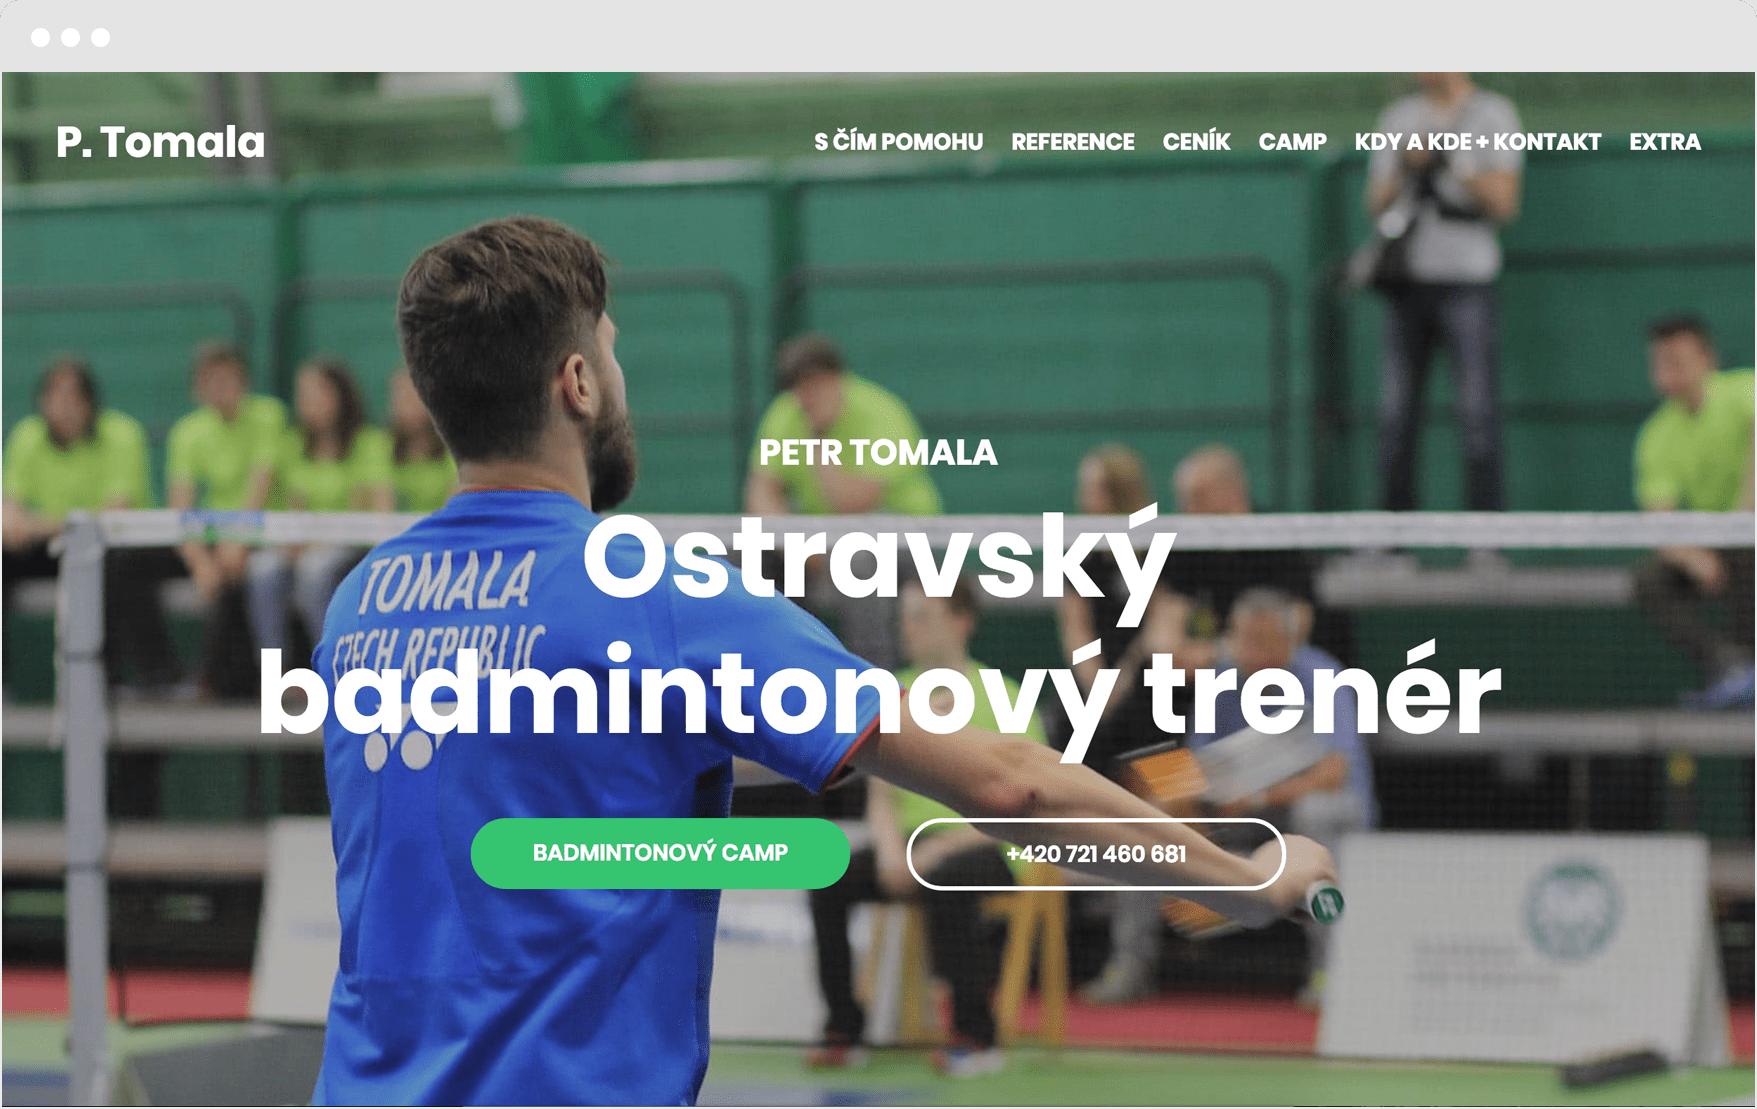 Reference www.trener-ostrava.cz